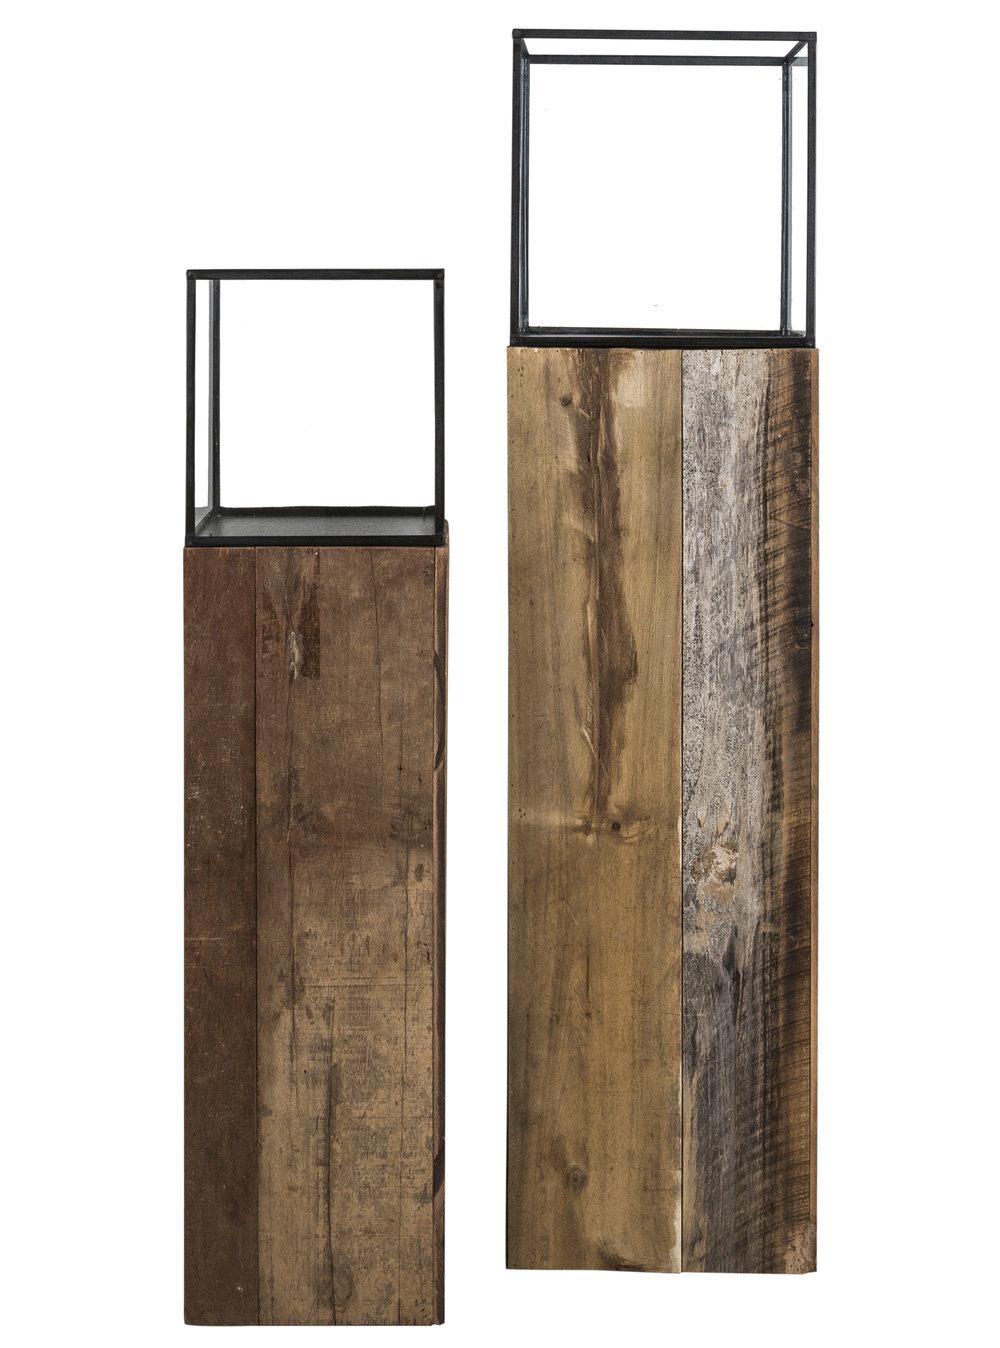 Blackwood lanterns